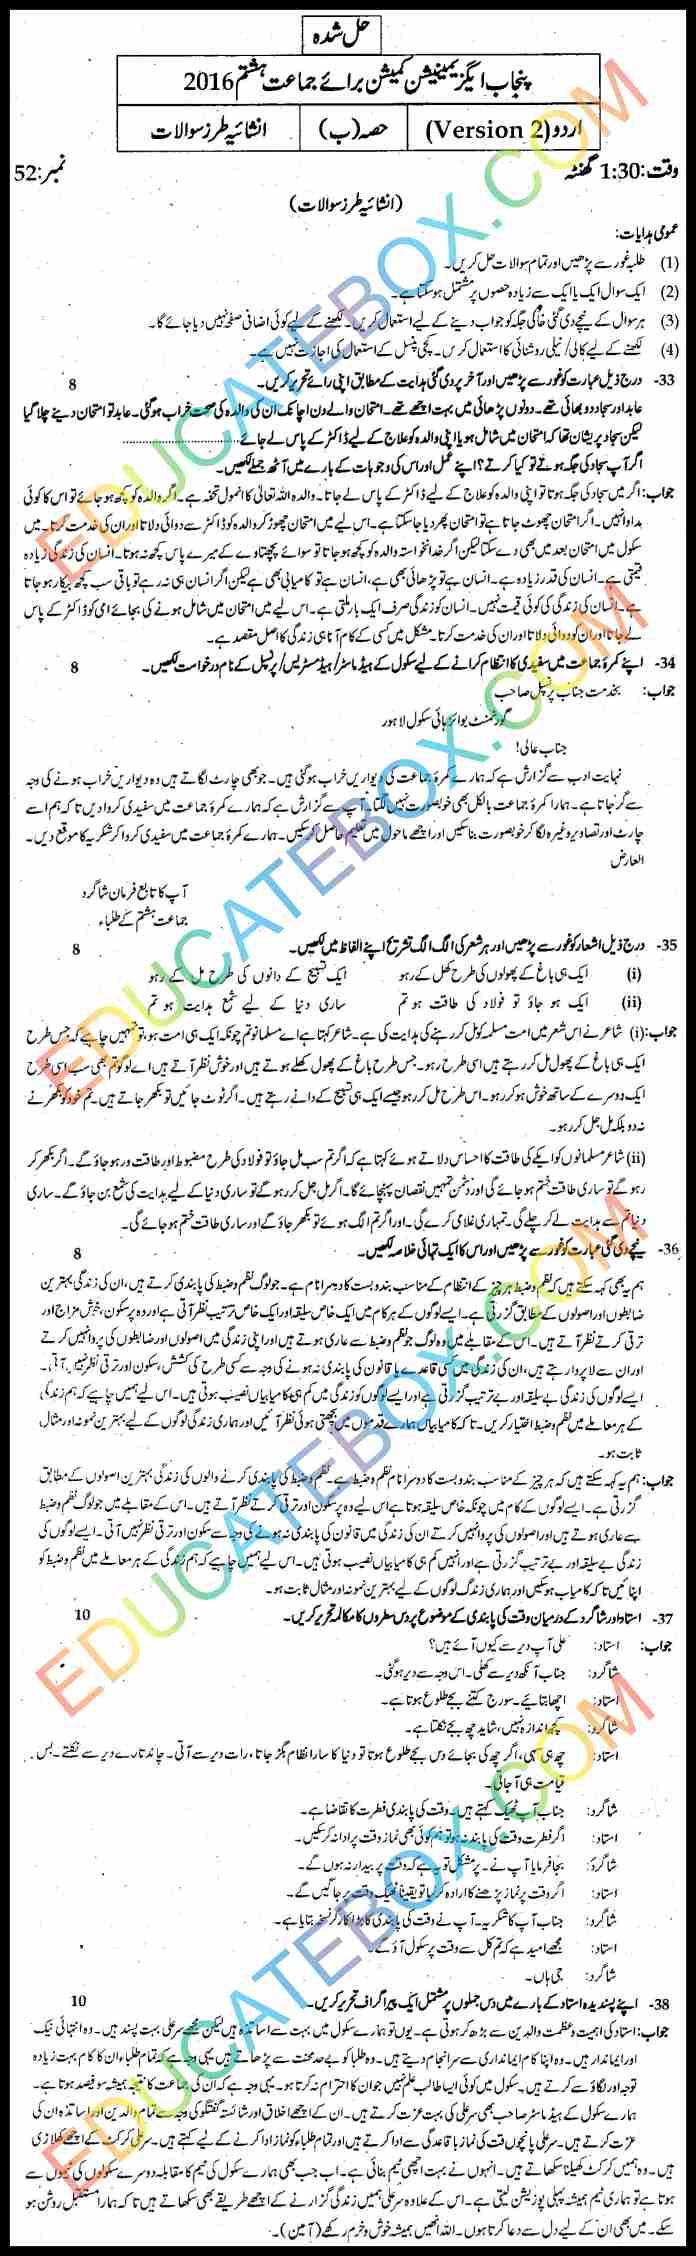 Past Paper 8th Class Urdu 2016 Solved Paper Punjab Board (PEC) Subjective Type Version 2 اپ ٹو ڈیٹ پیپر آٹھویں کلاس اردو 2016 حل شدہ پیپر پنجاب بورڈ انشائیہ طرز۔ ورژن2